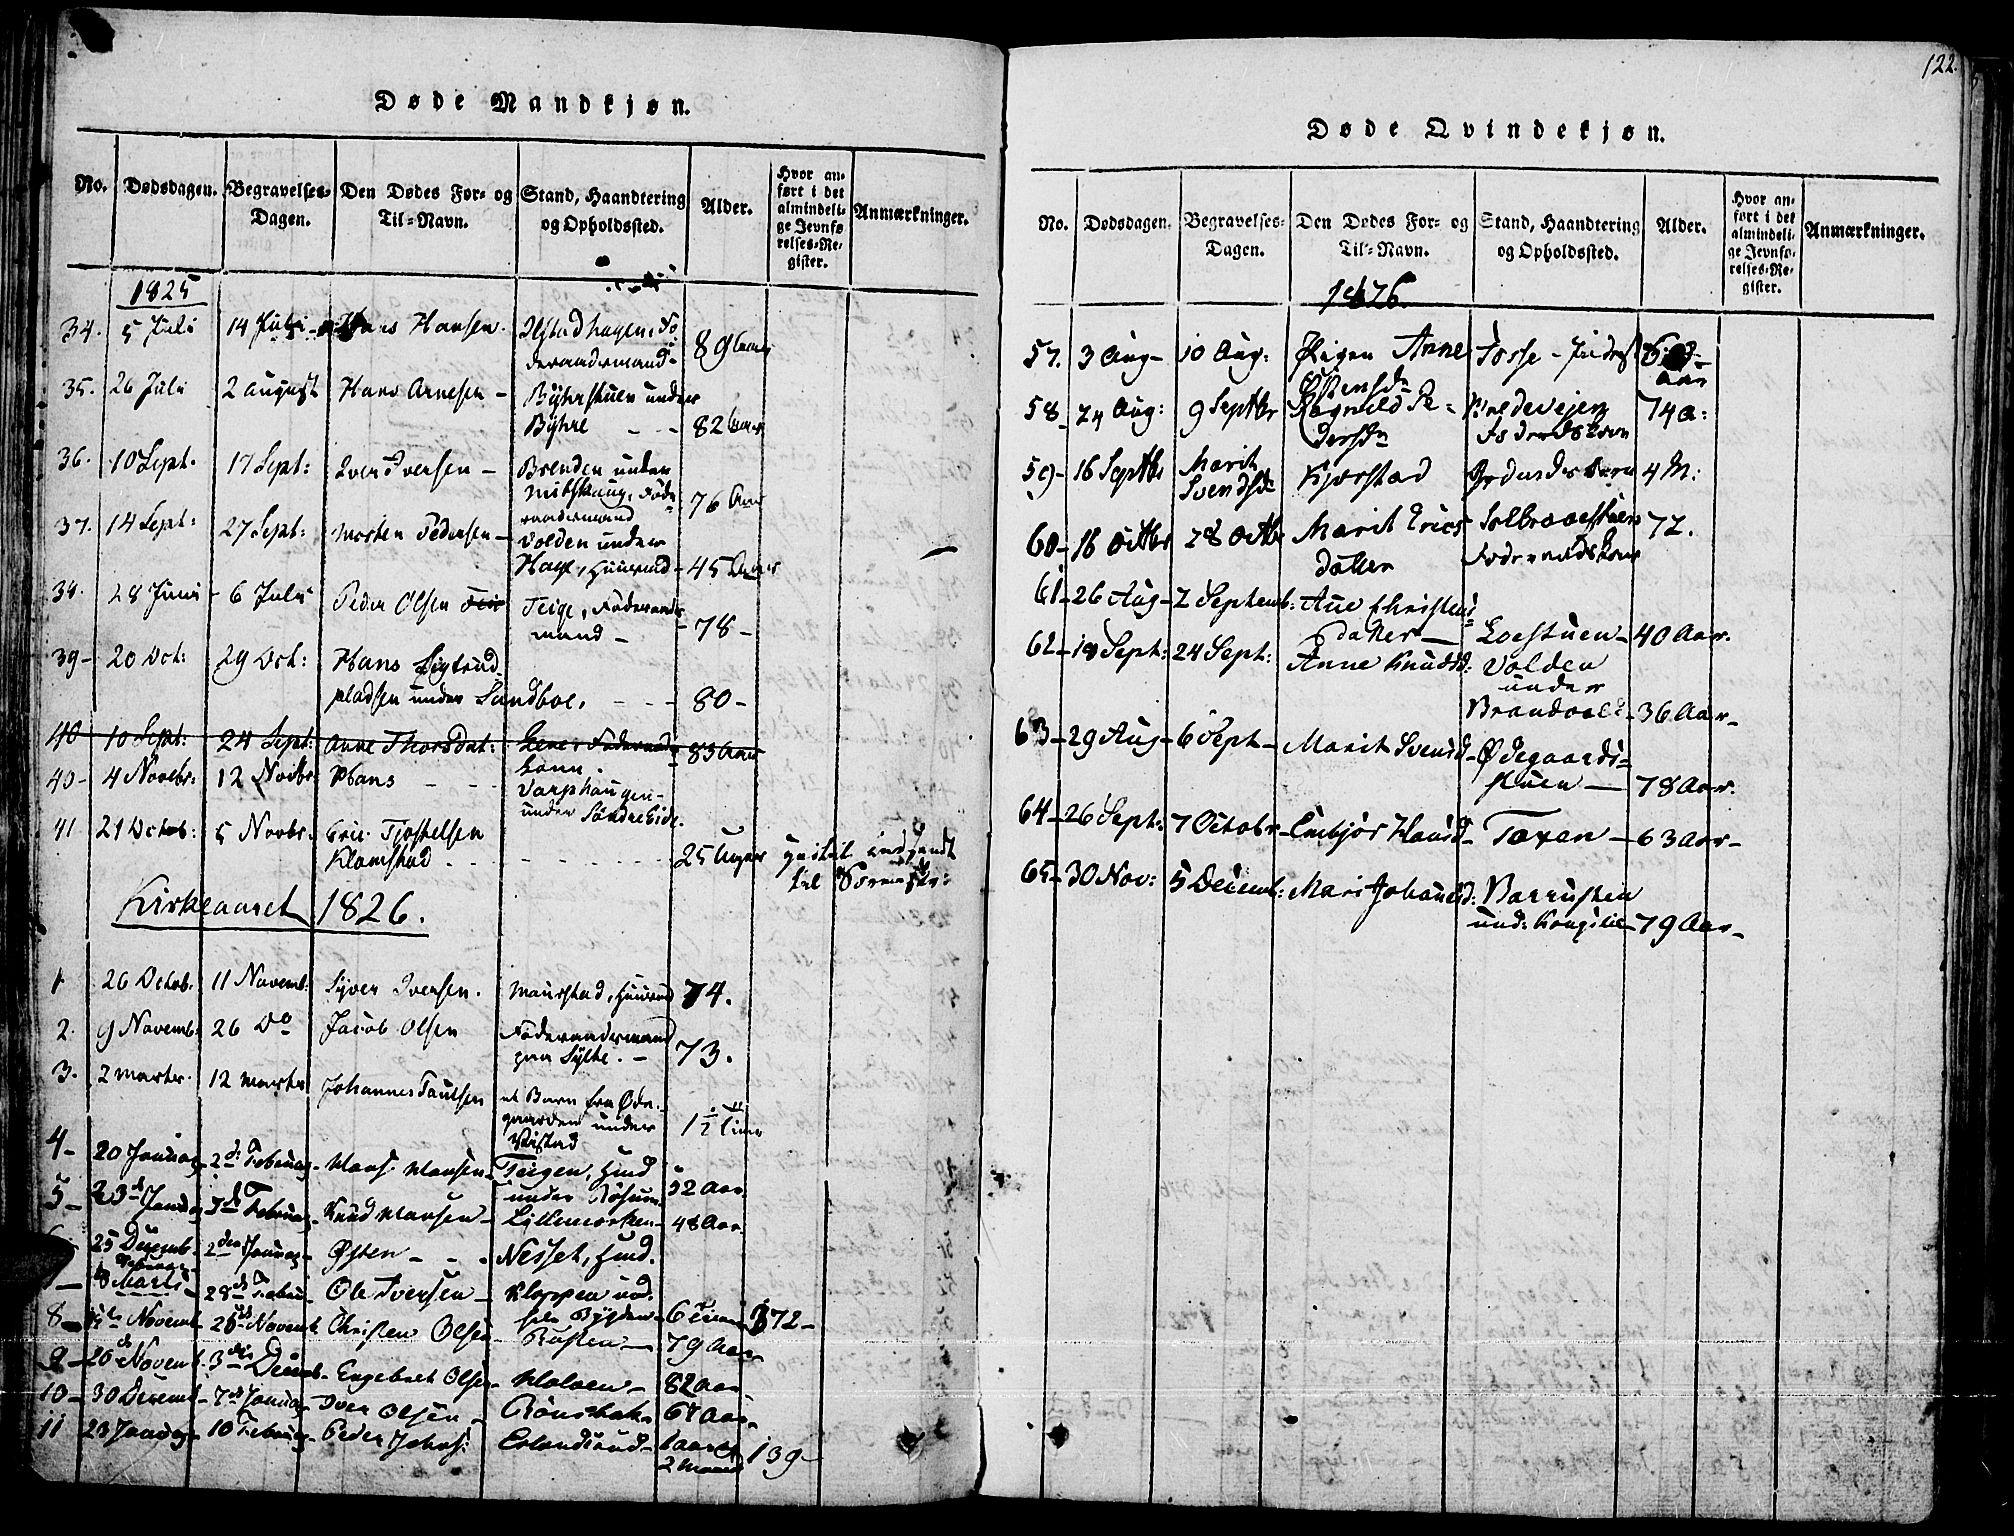 SAH, Fron prestekontor, H/Ha/Haa/L0002: Ministerialbok nr. 2, 1816-1827, s. 122